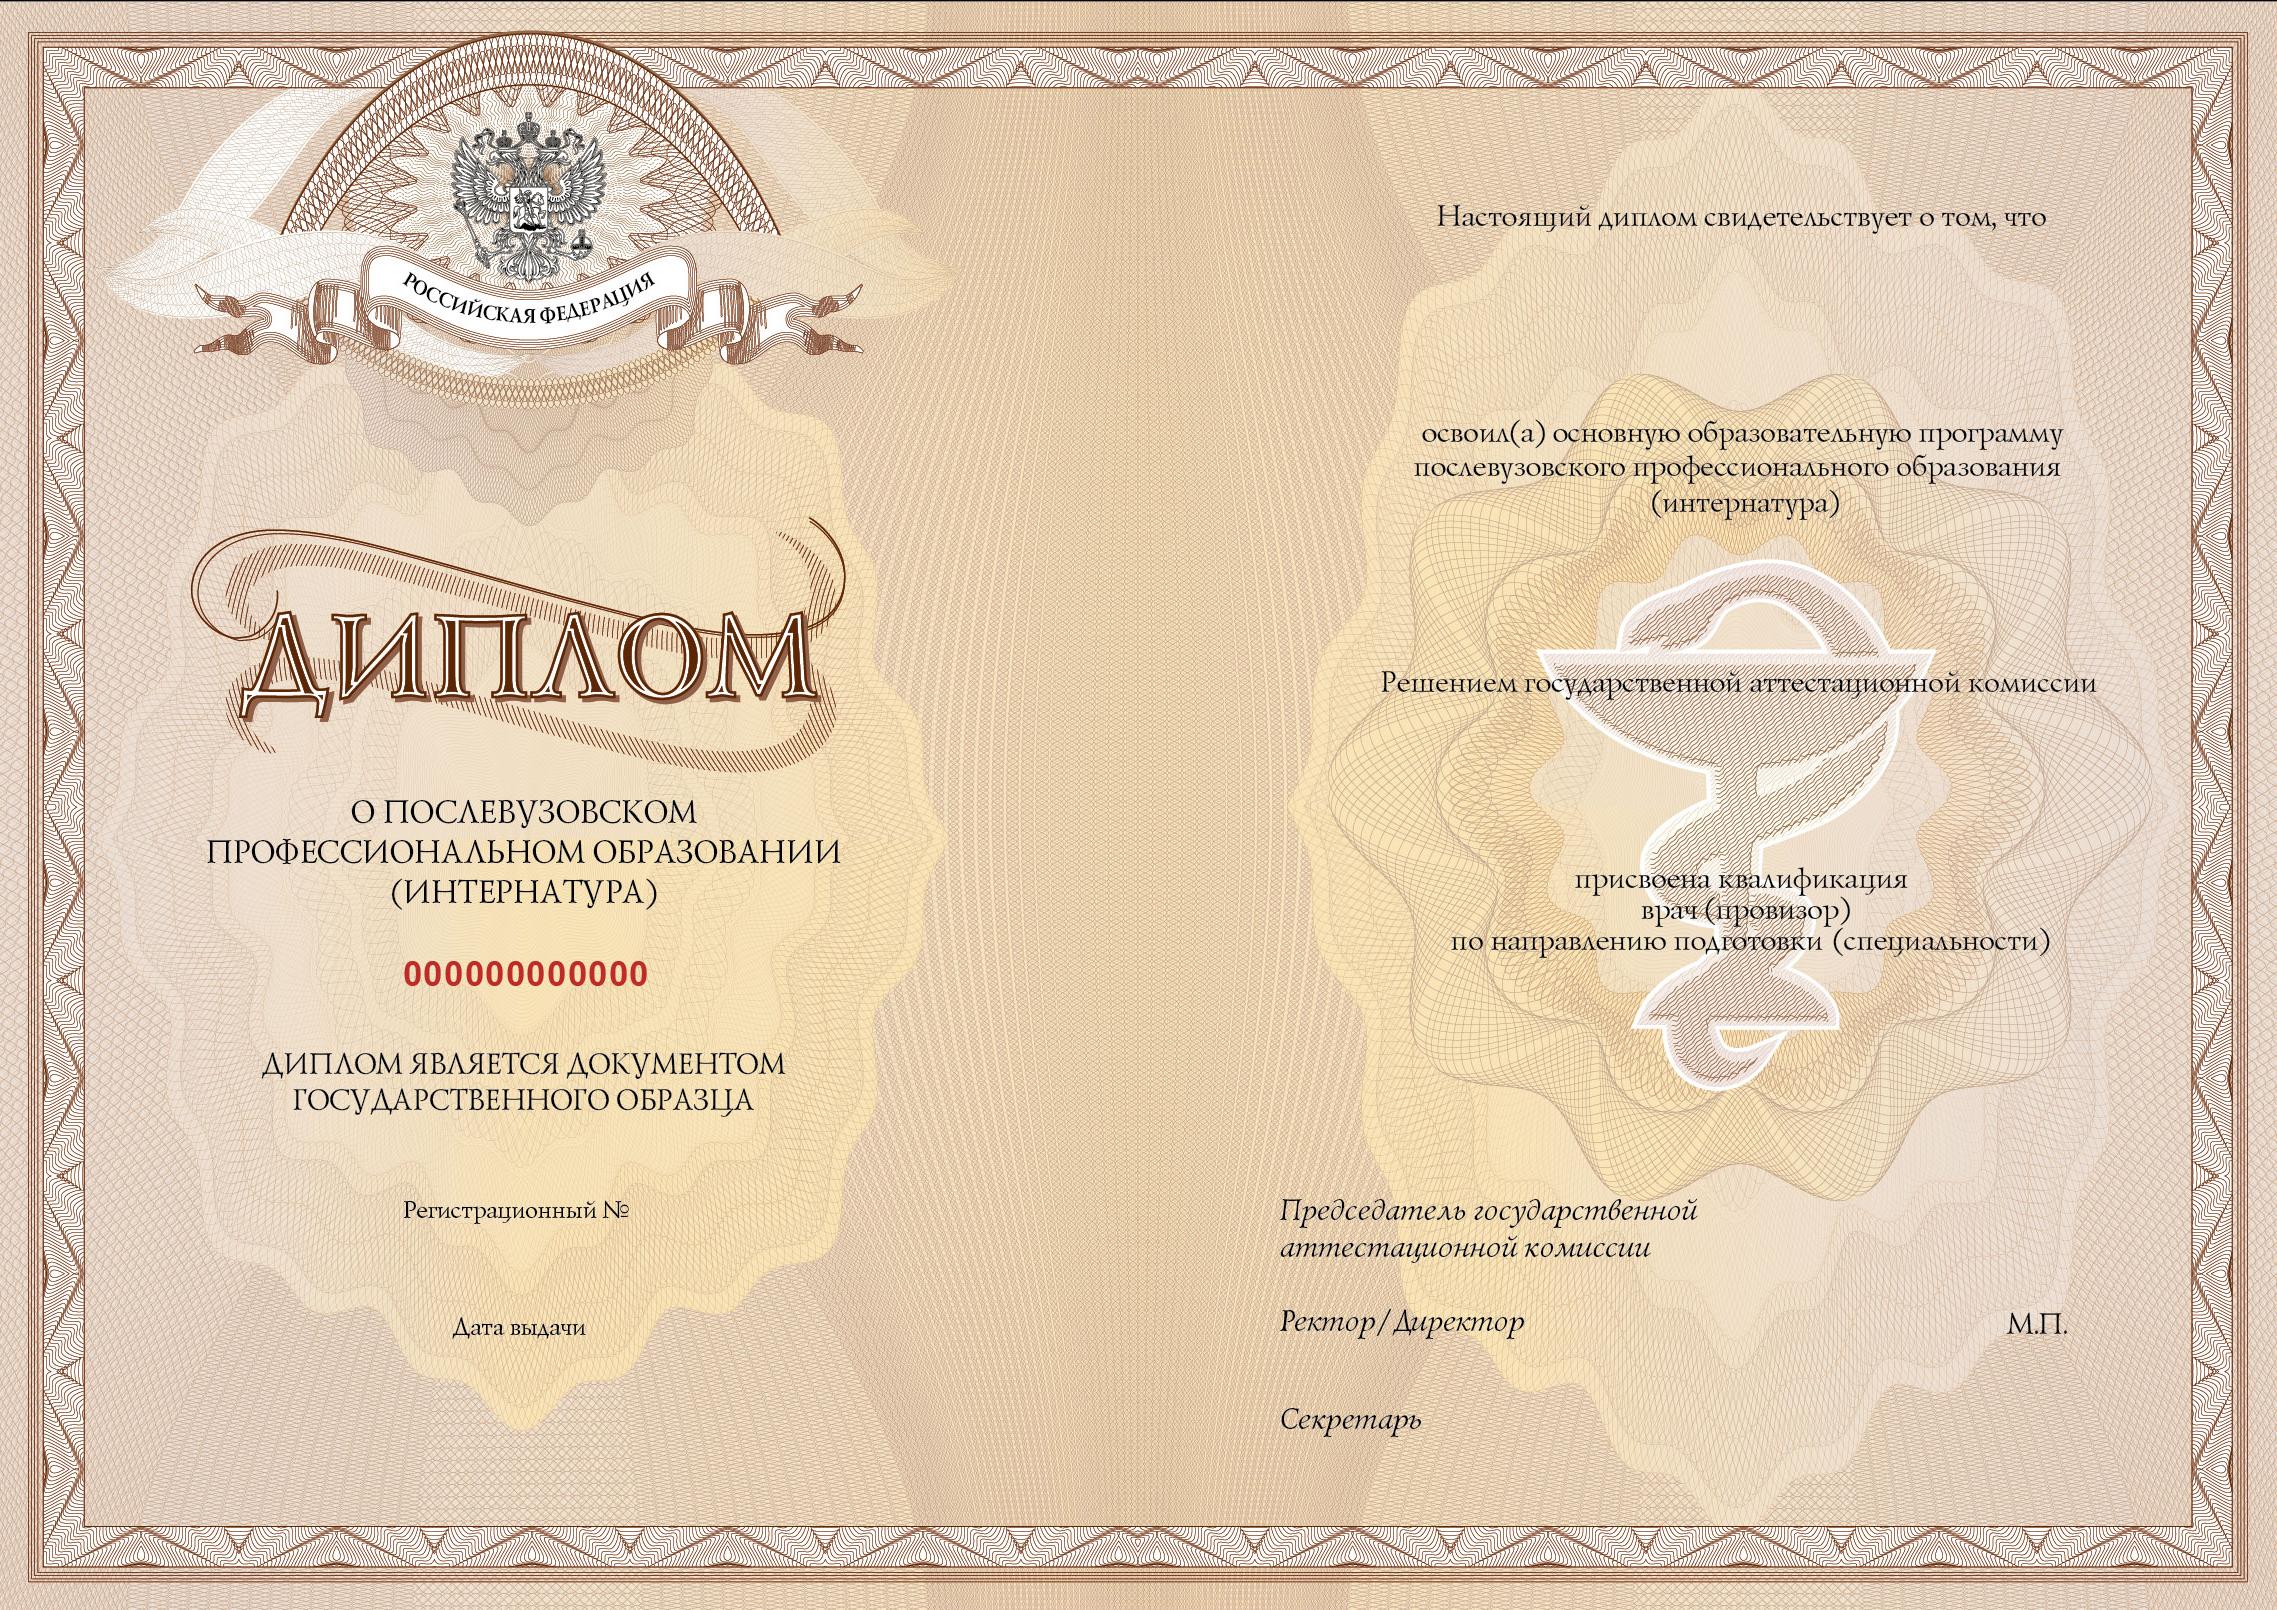 Бланки дипломов аспиранта ординатора интерна Изготовить бланк диплома интерна Бланк диплома об окончании интернатуры